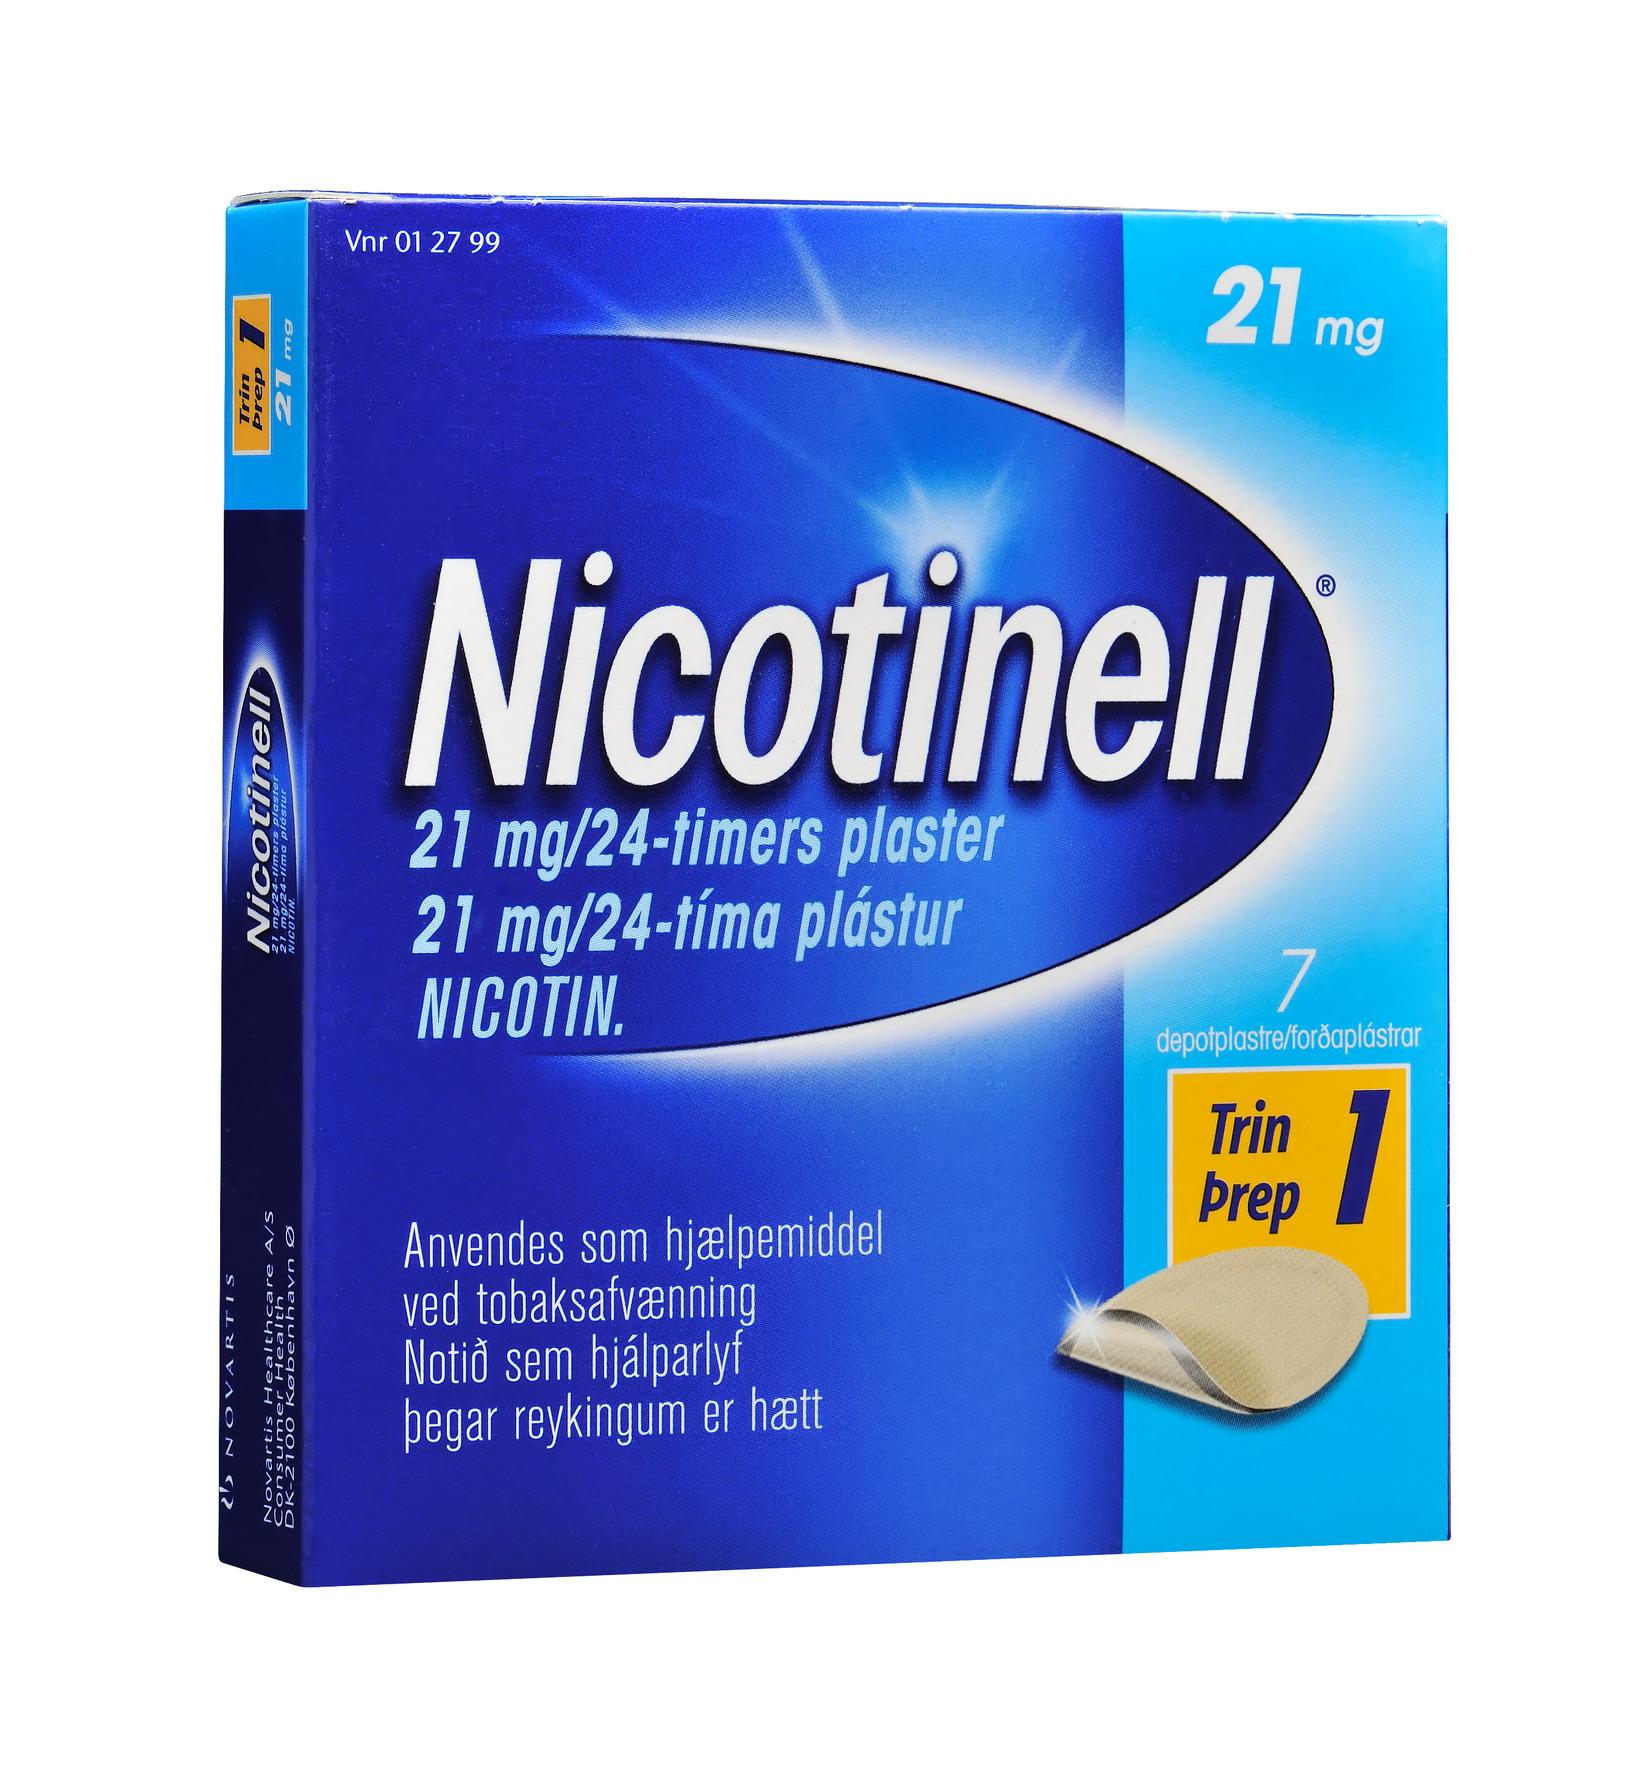 nicotinell plaster pris